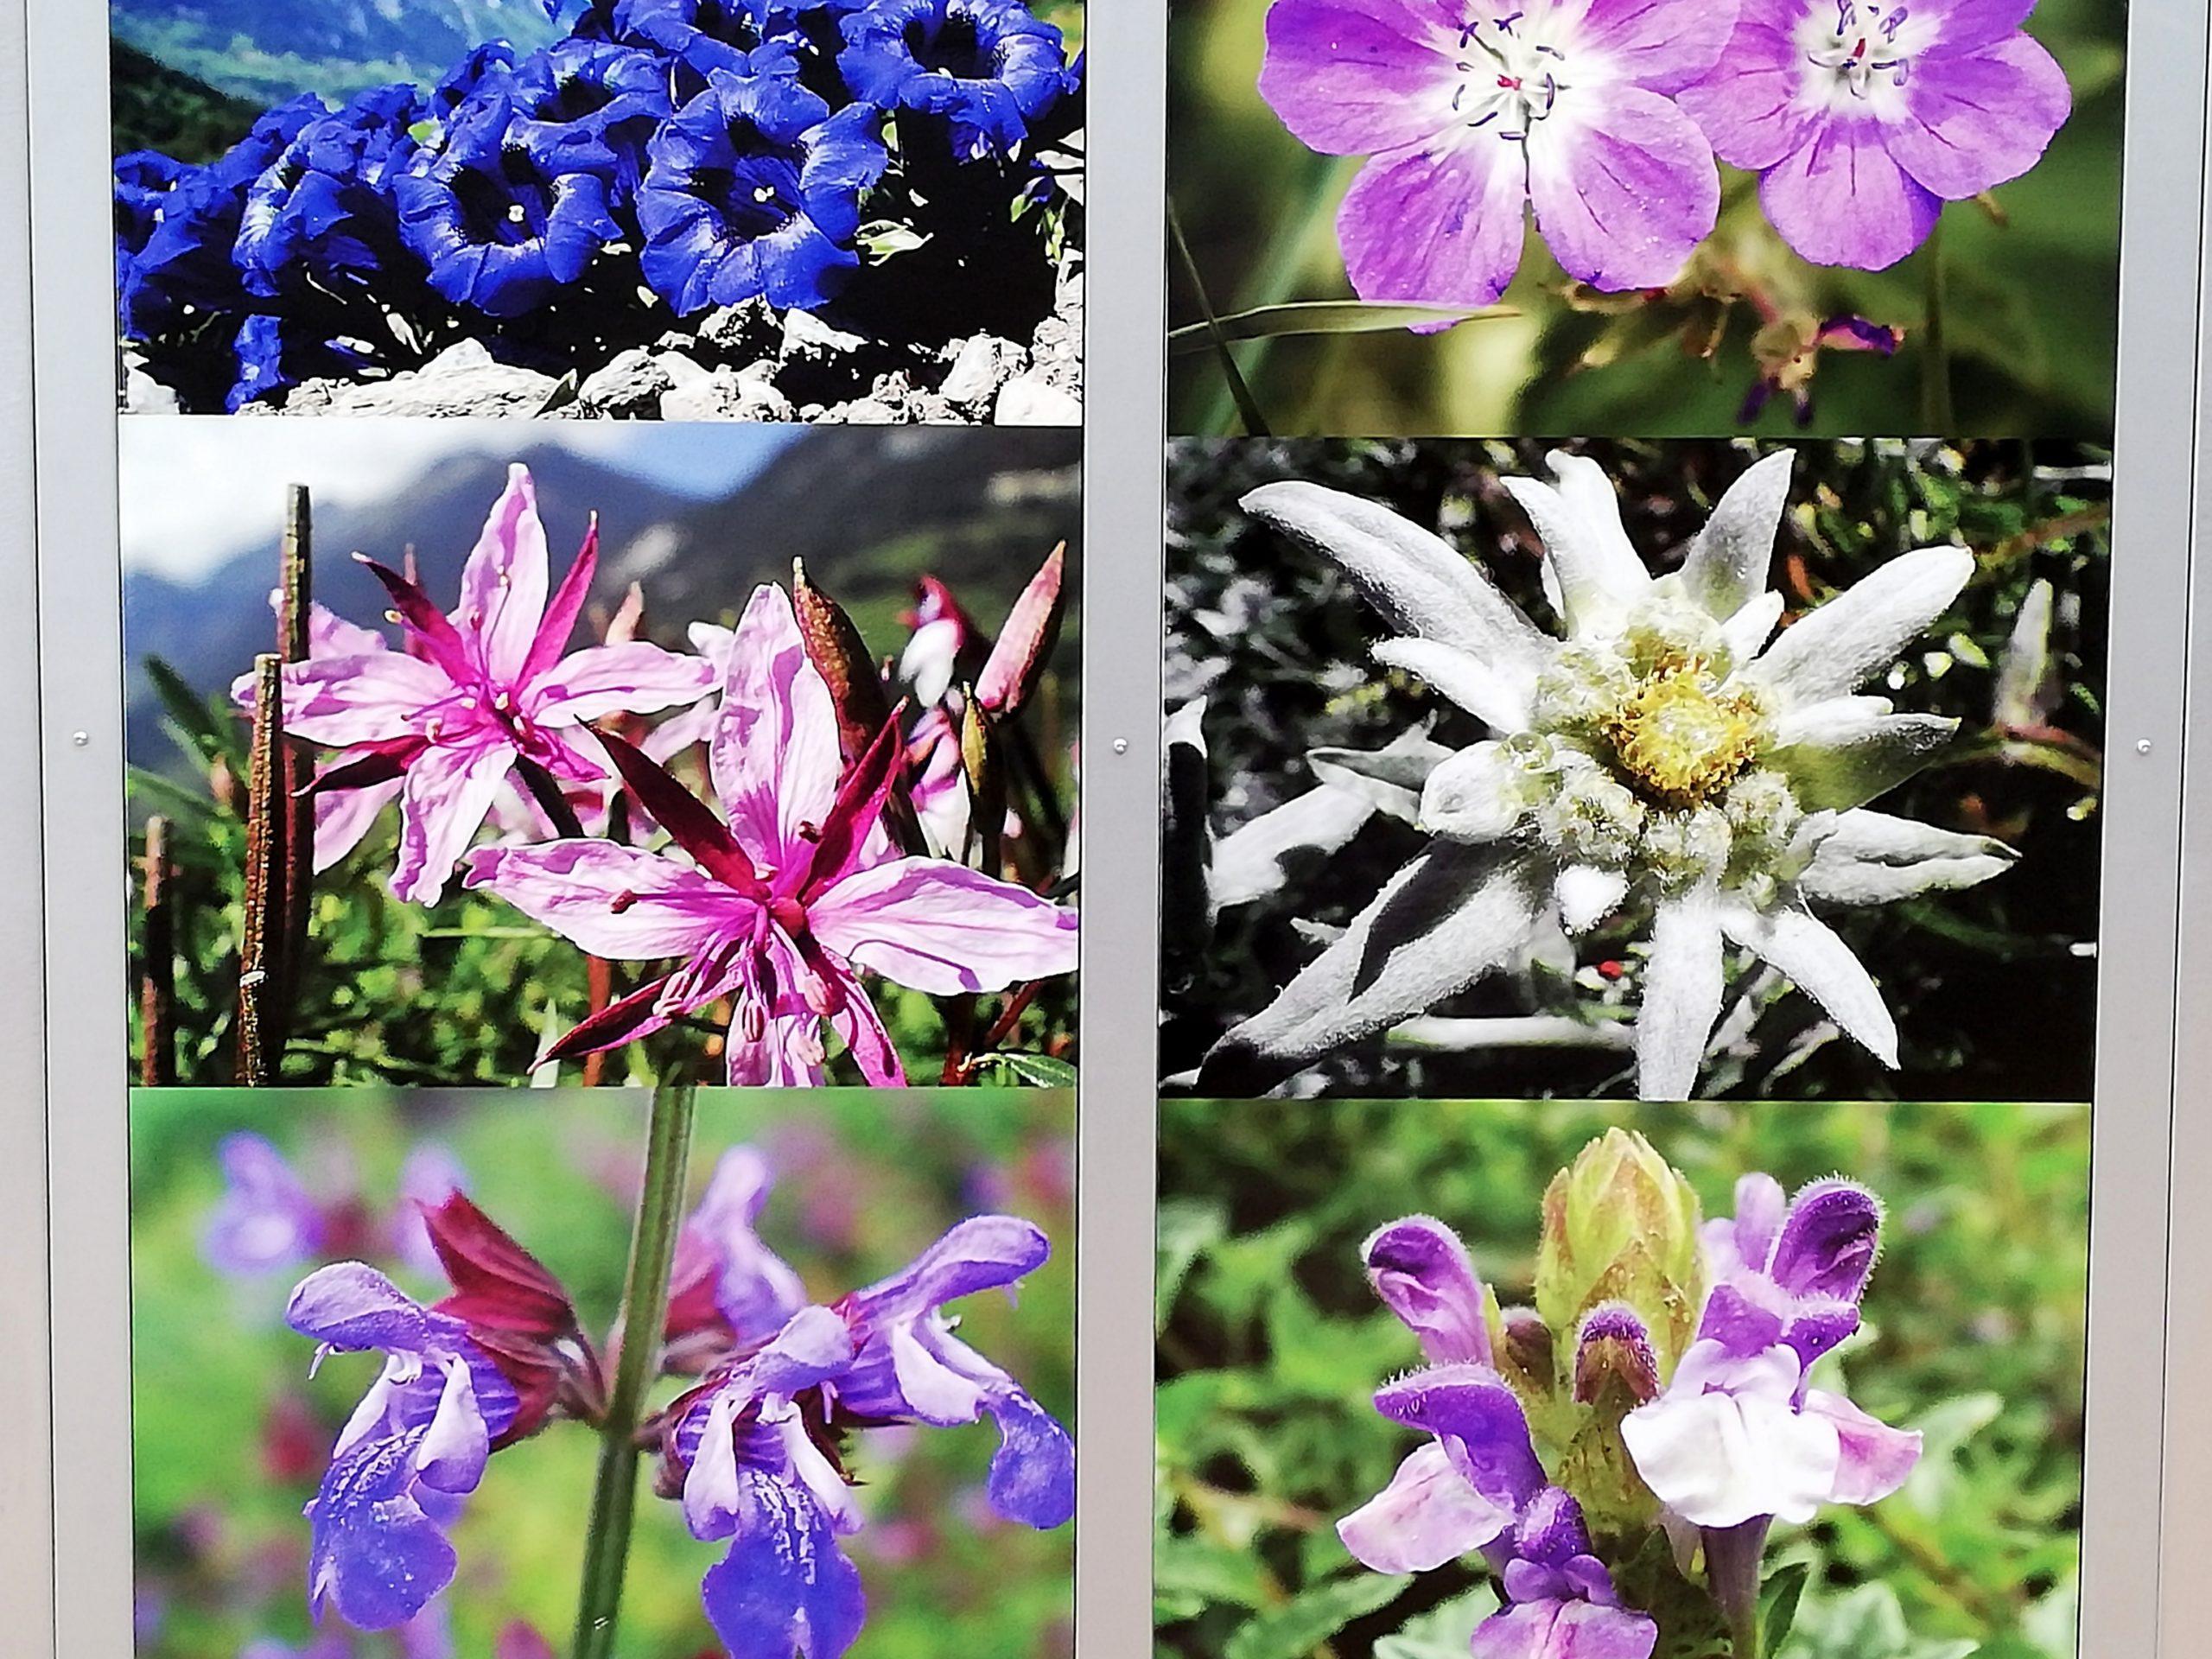 Plantes aromatiques Valplantes et Ricola Suisse